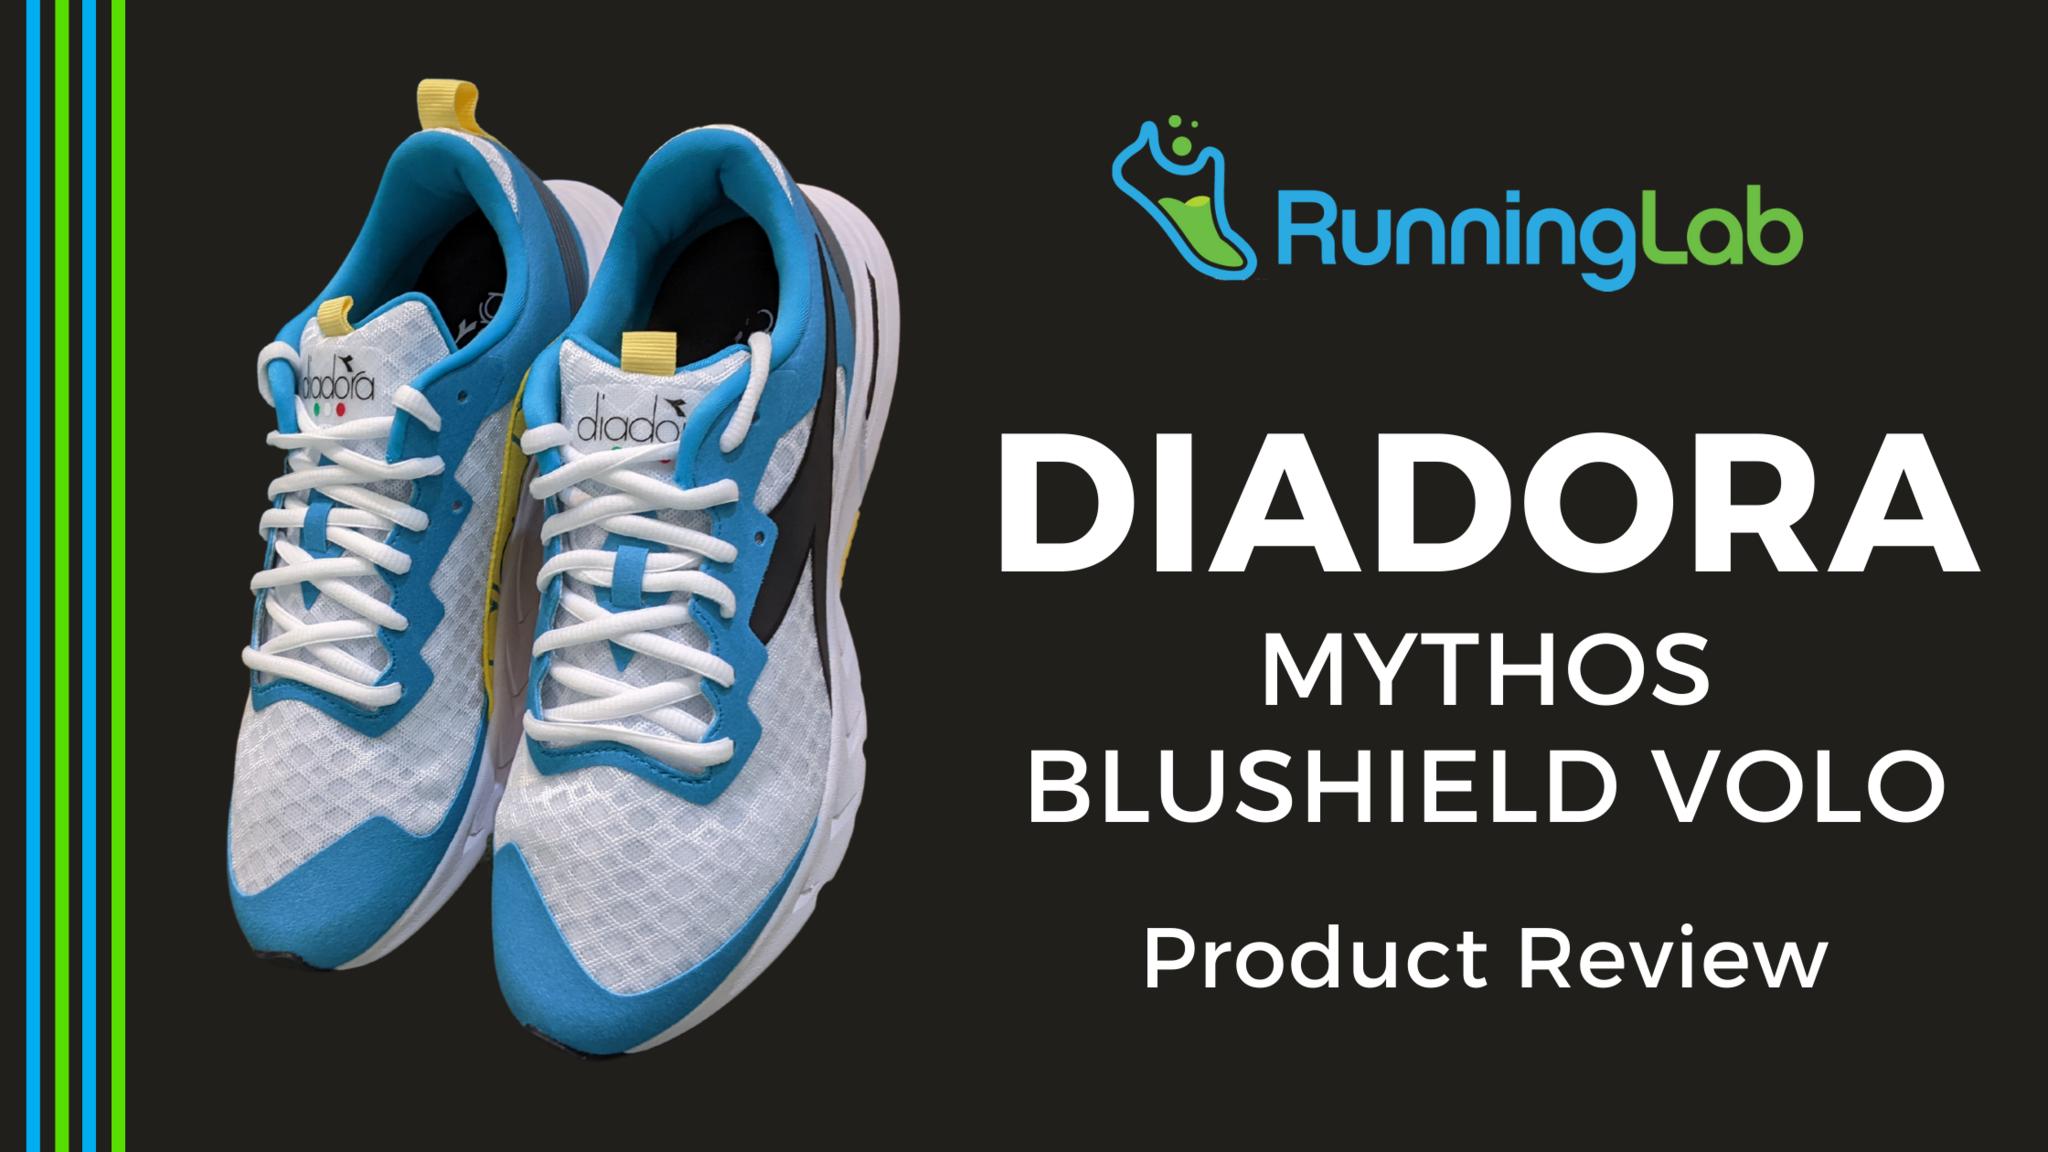 Diadora Mythos Blushield Volo